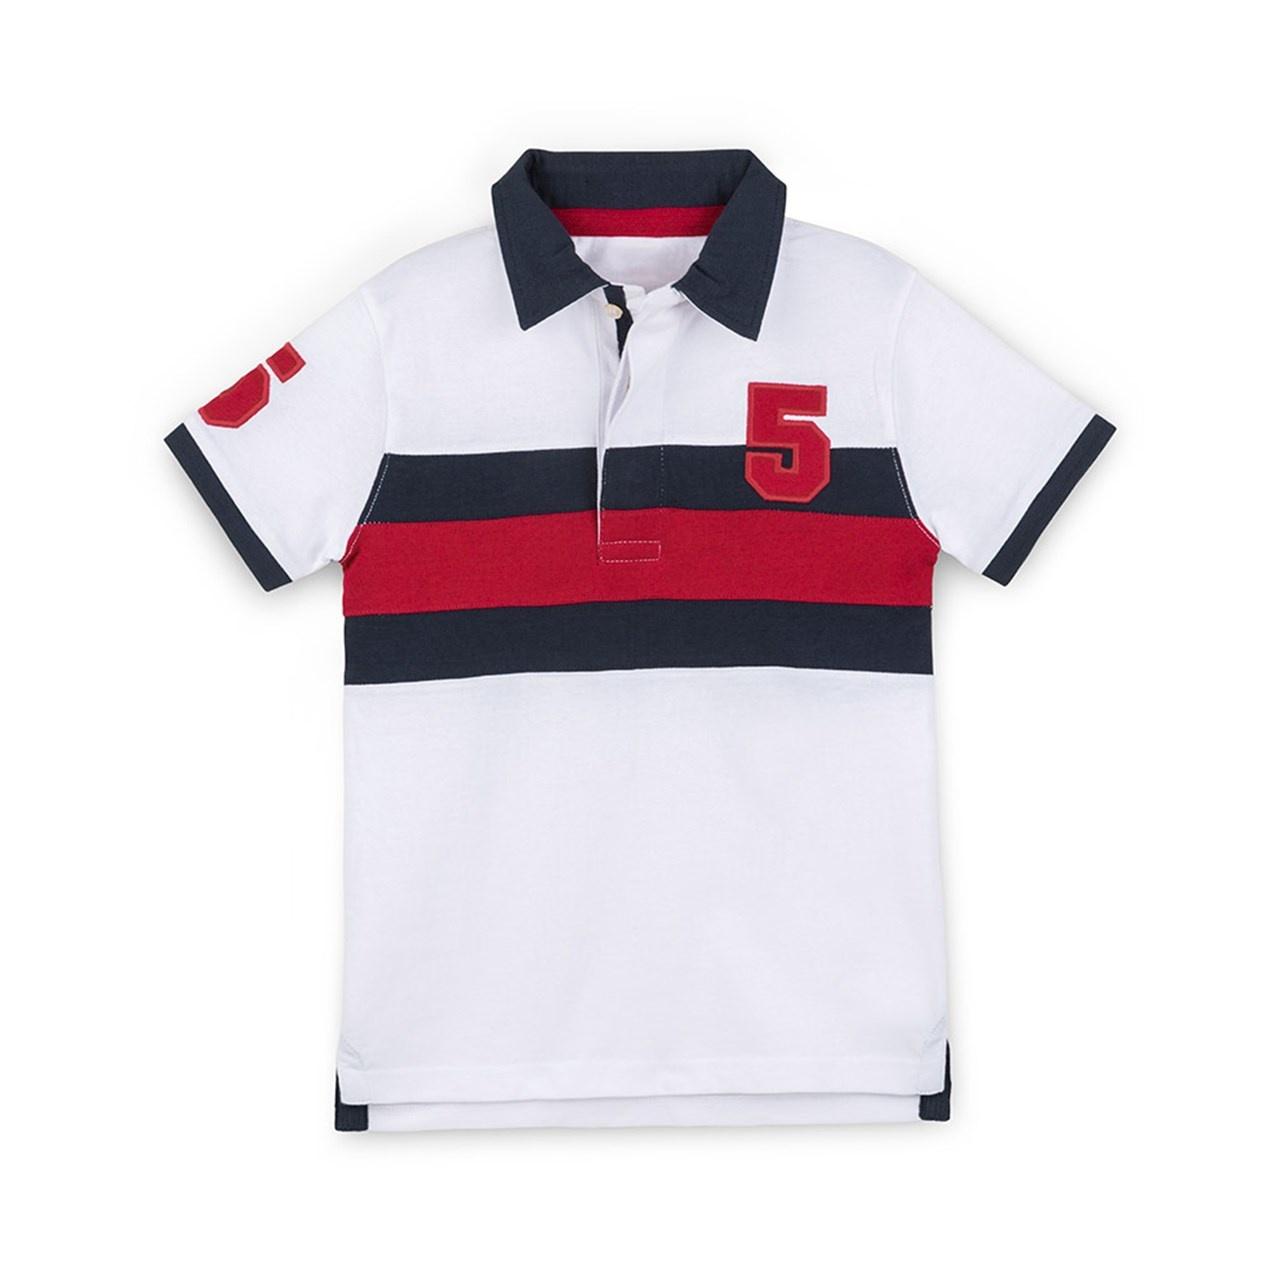 پولو شرت پسرانه گوکو کد 7